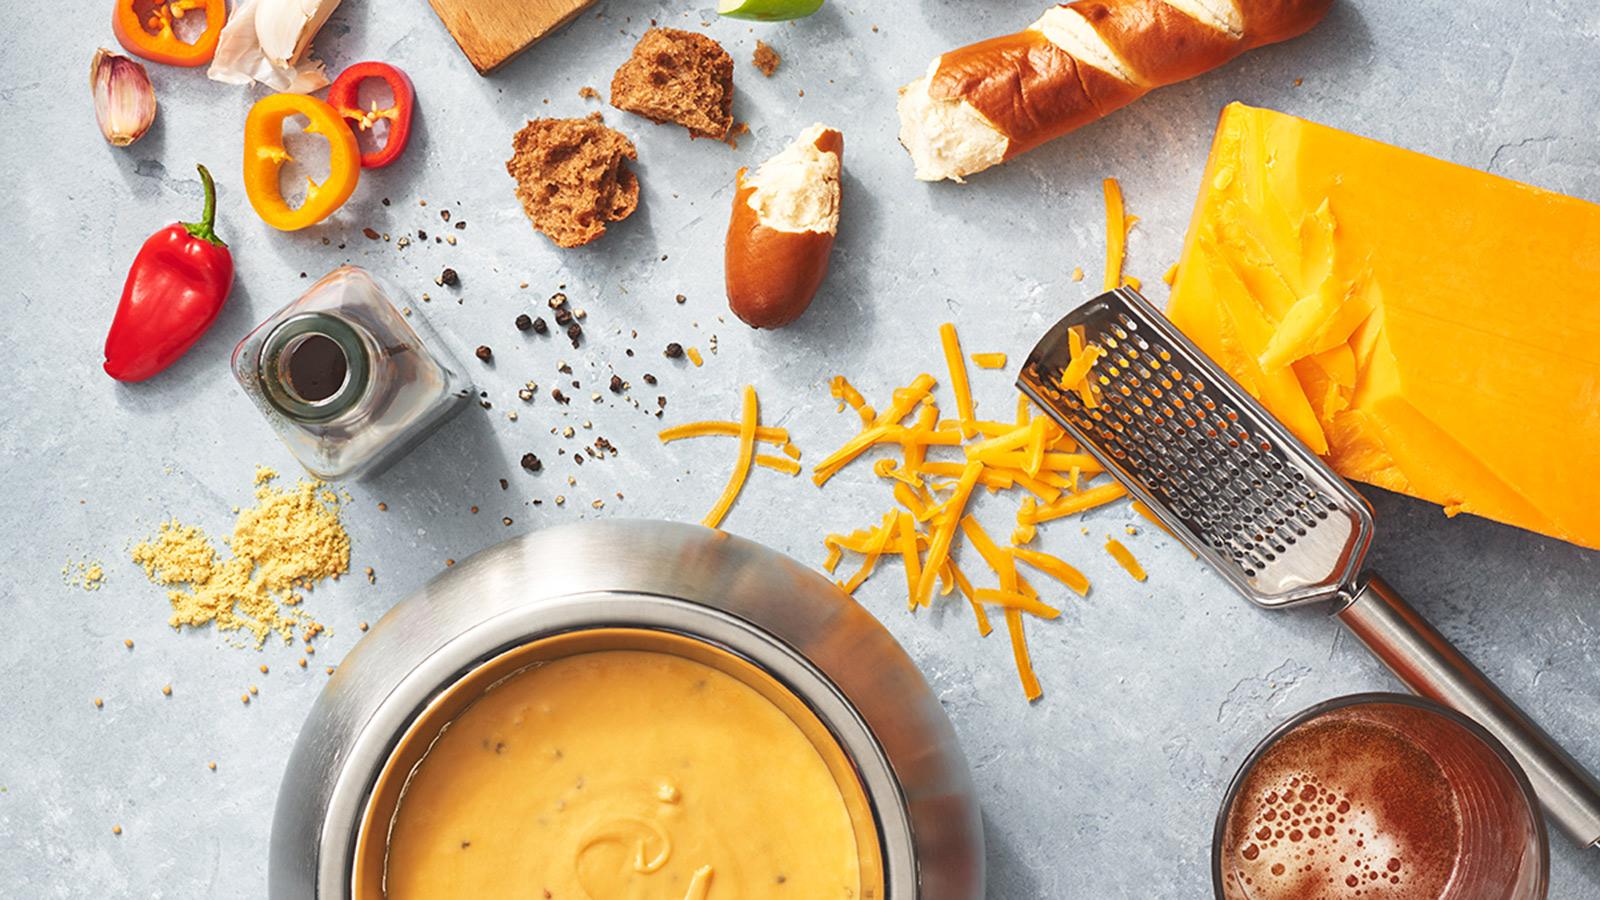 Cheddar Cheese Fondue Ingredients